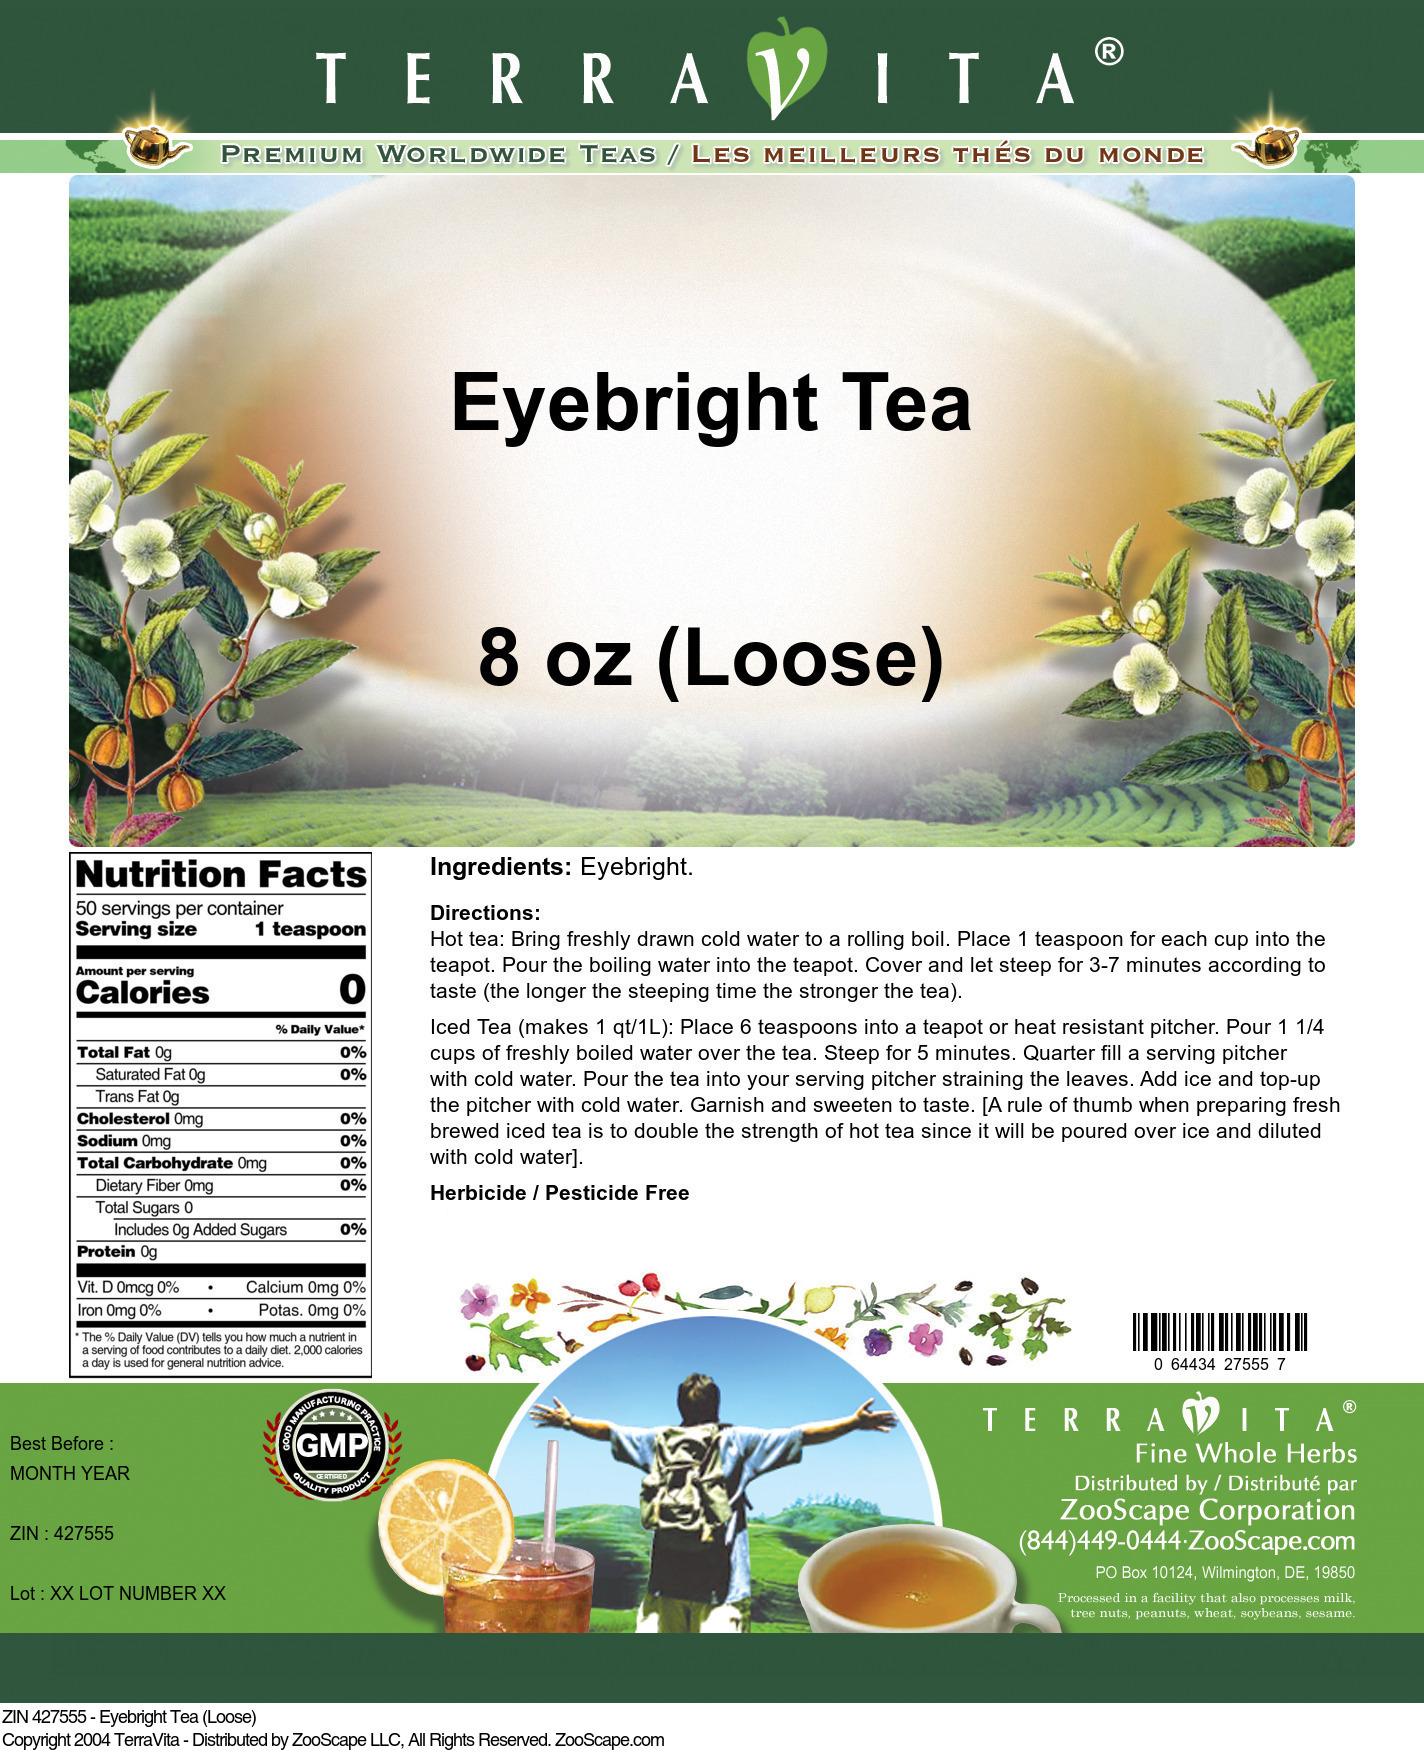 Eyebright Tea (Loose)